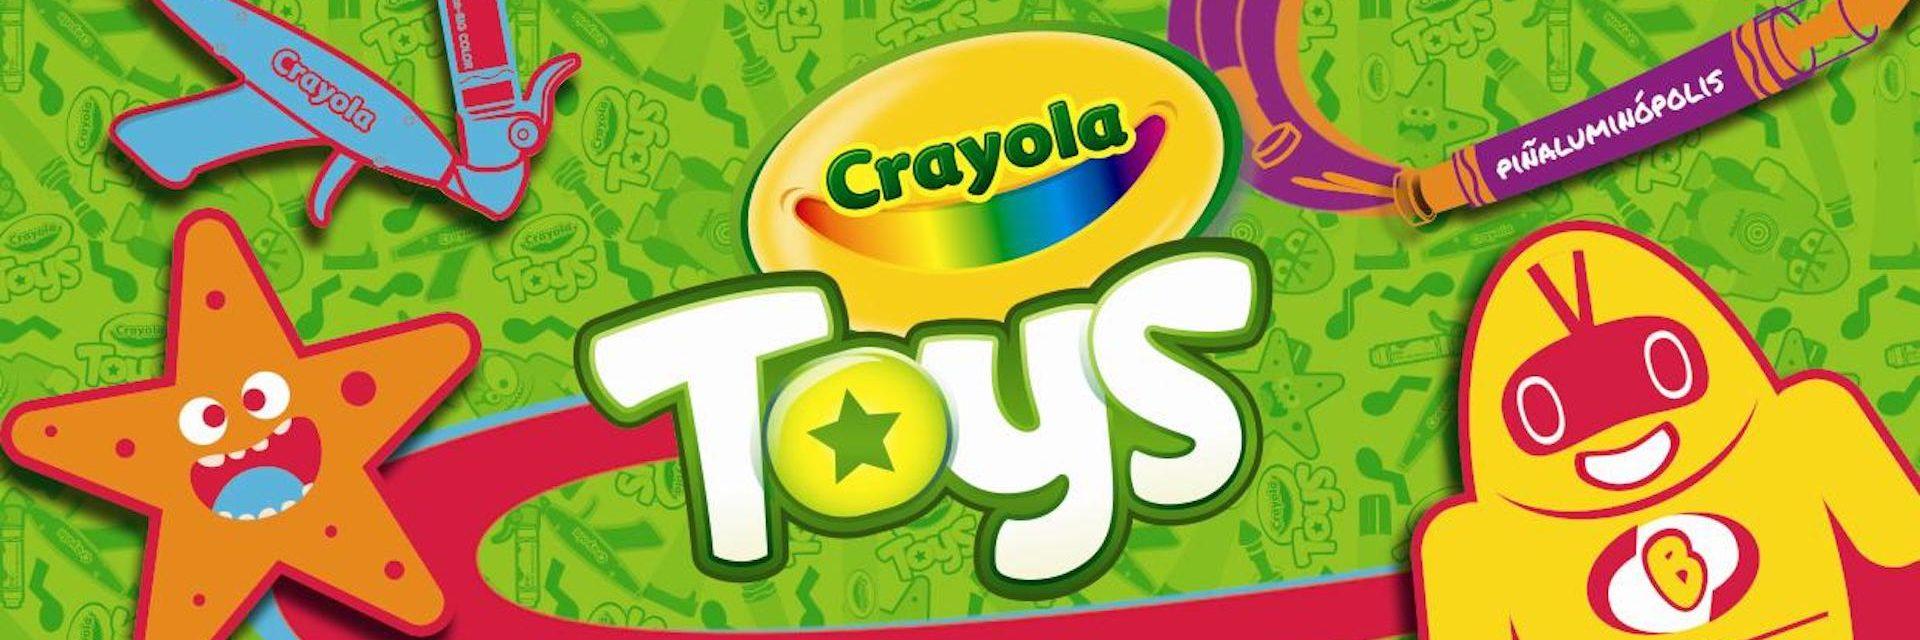 Crayola giochi creativi portadaweb